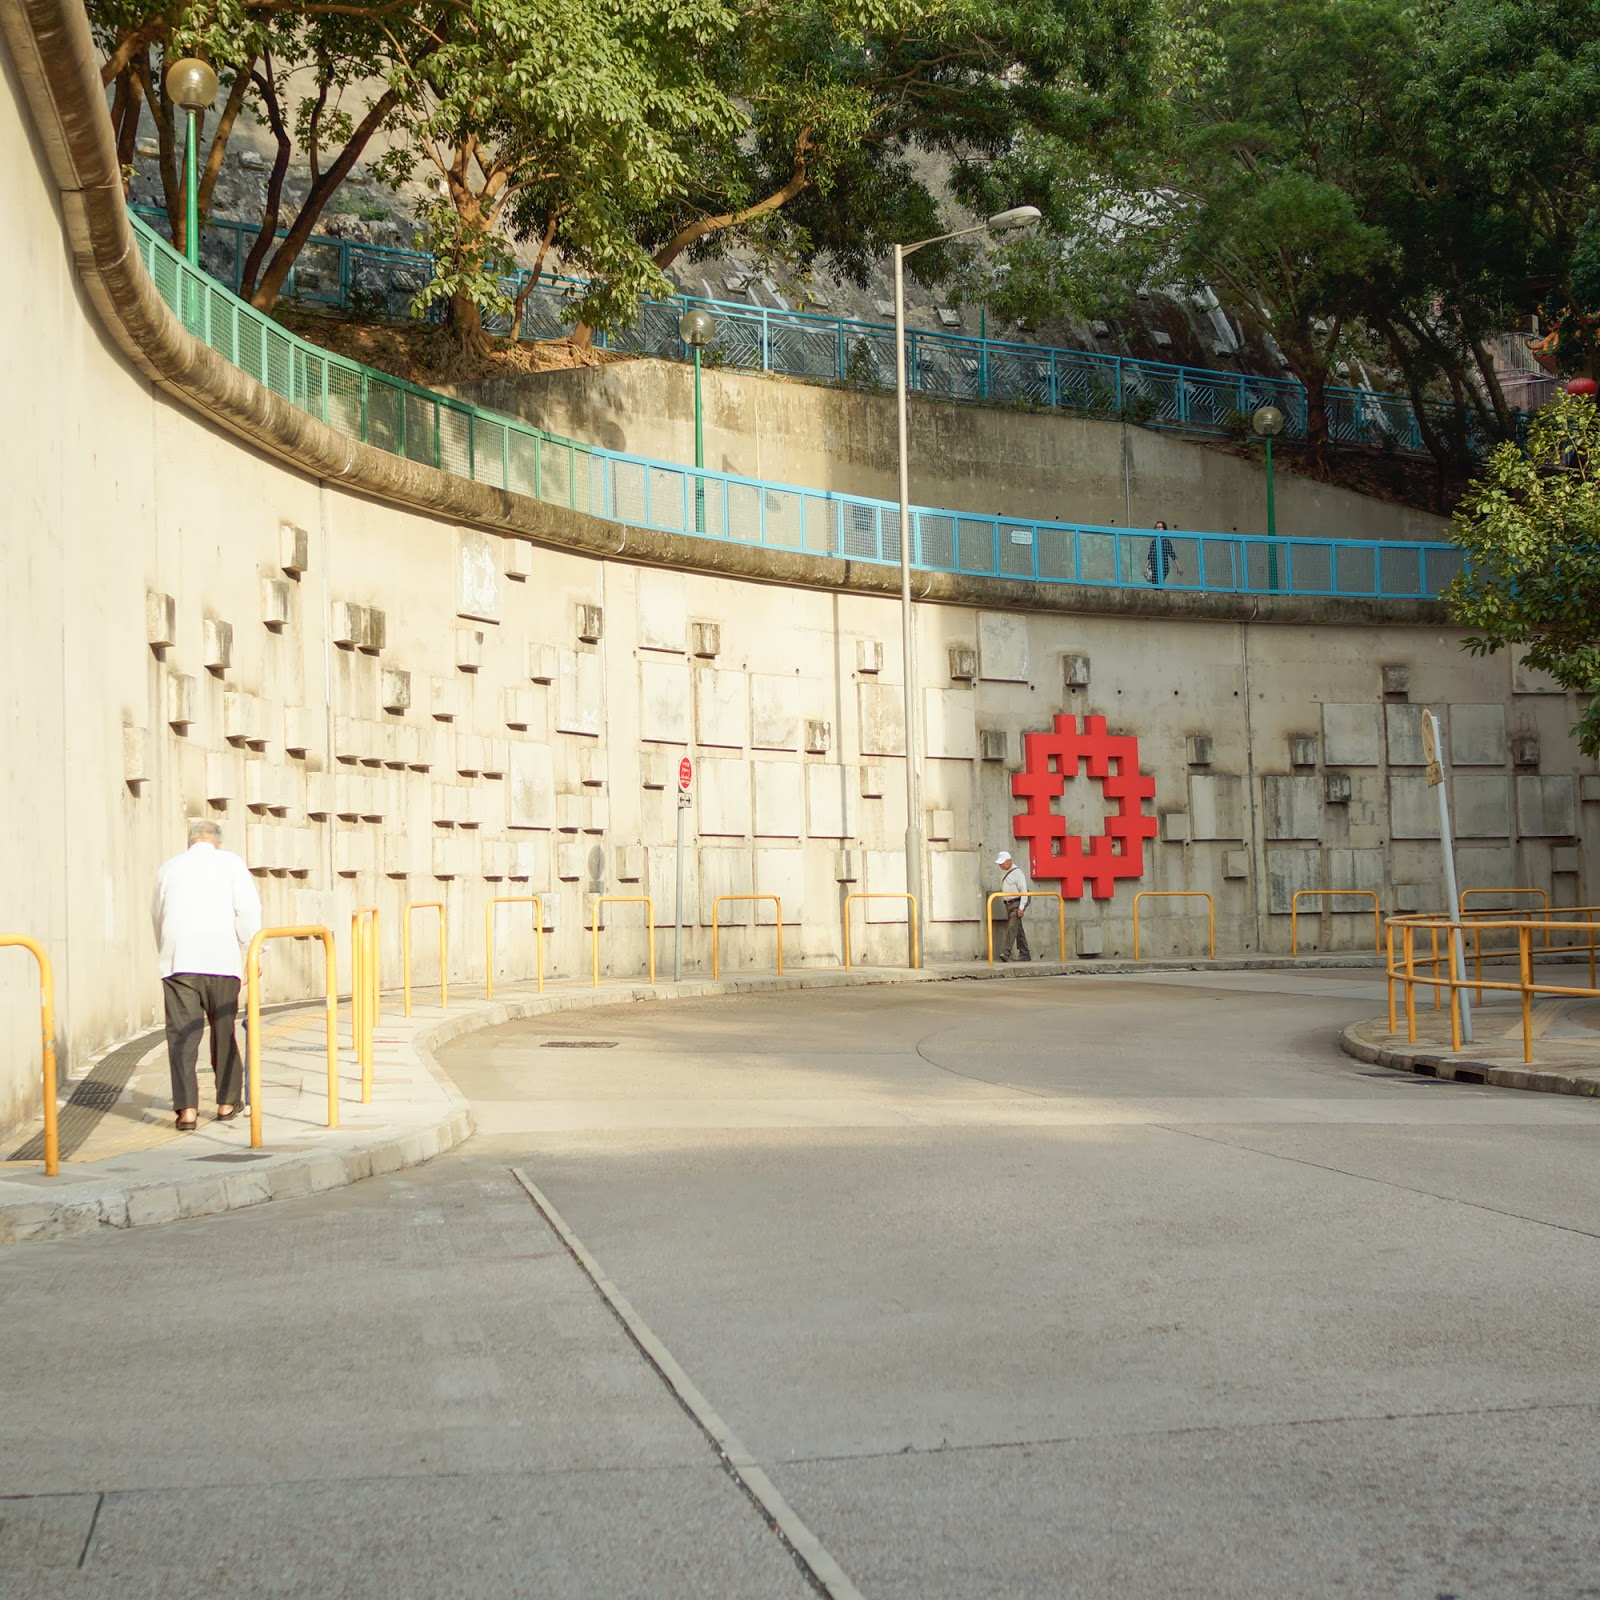 香港公共屋邨 • 日常 | Hong Kong Public Housing Estates • Daily: 觀塘 • 翠屏邨 | Kwun Tong • Tsui Ping Estate